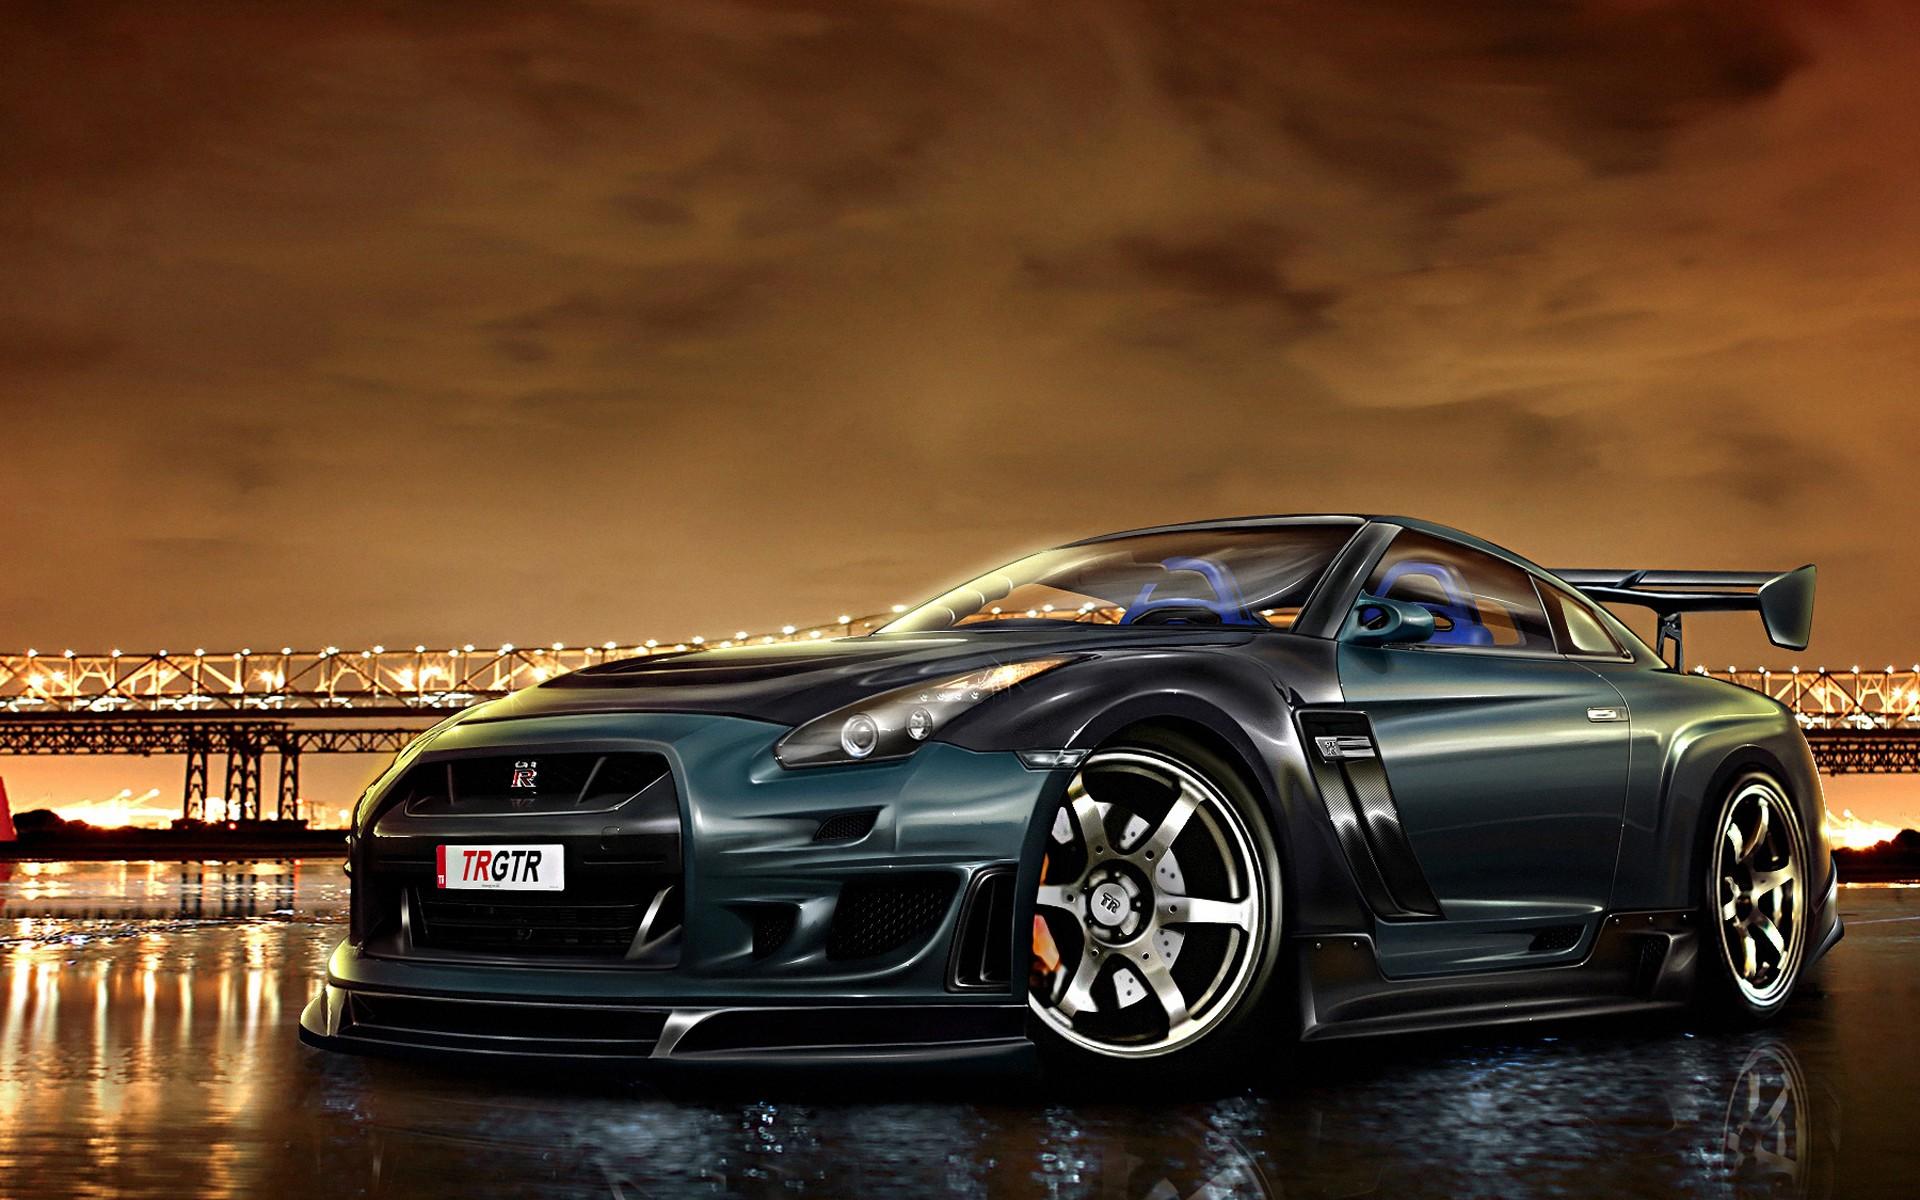 it next you will see the most impressive super car designs at present 1920x1200